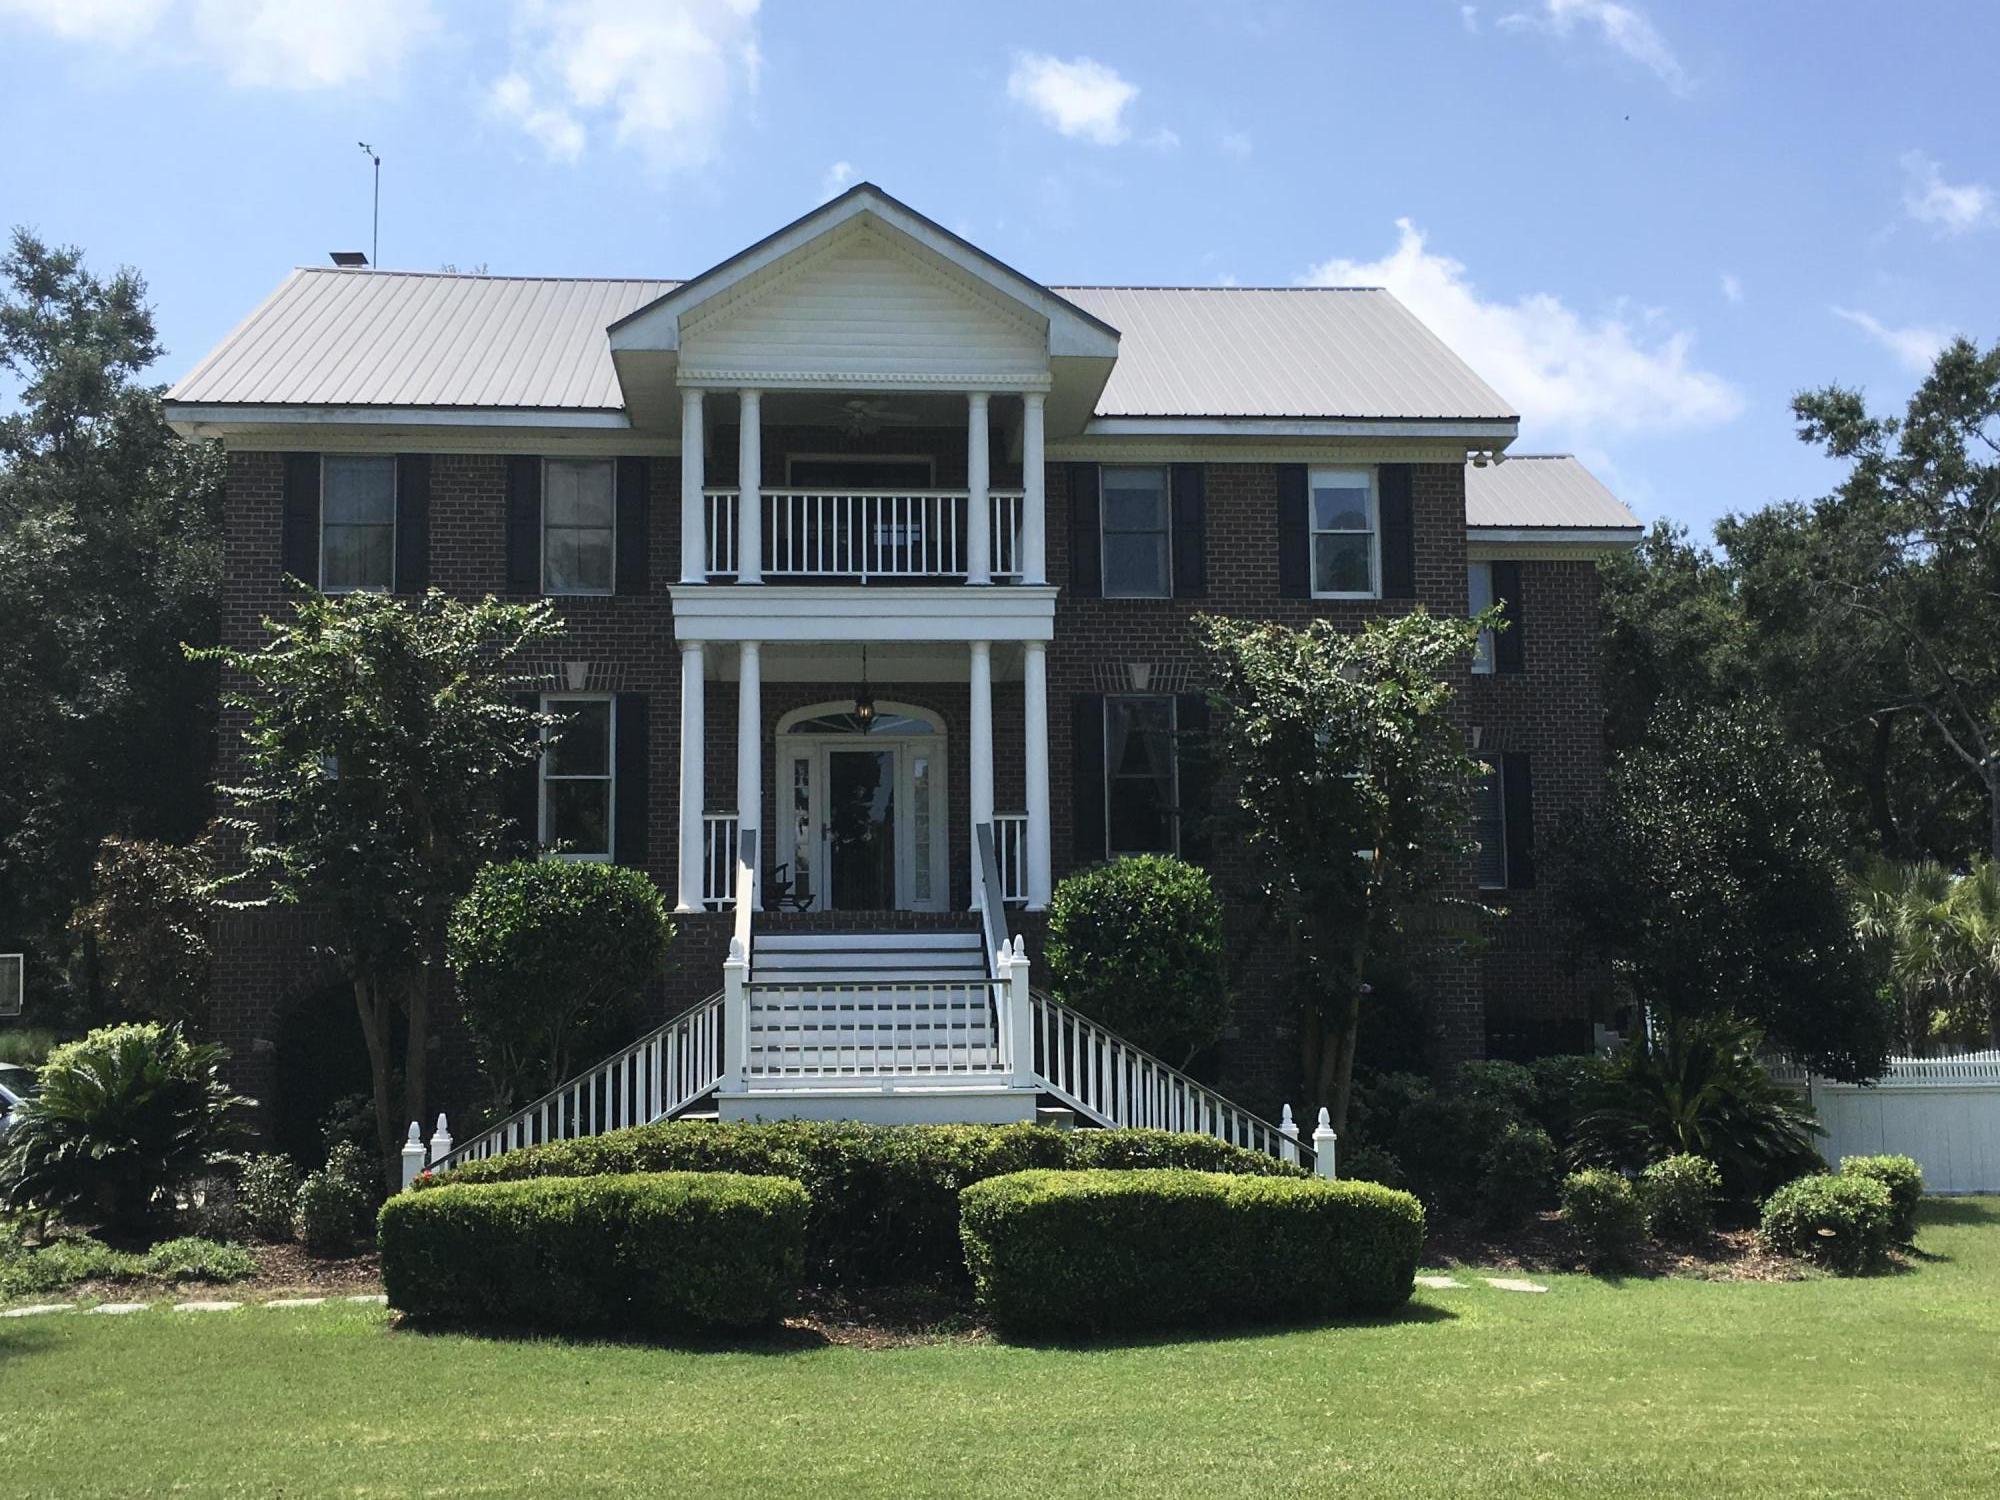 Photo of 449 Wampler Dr, Charleston, SC 29412